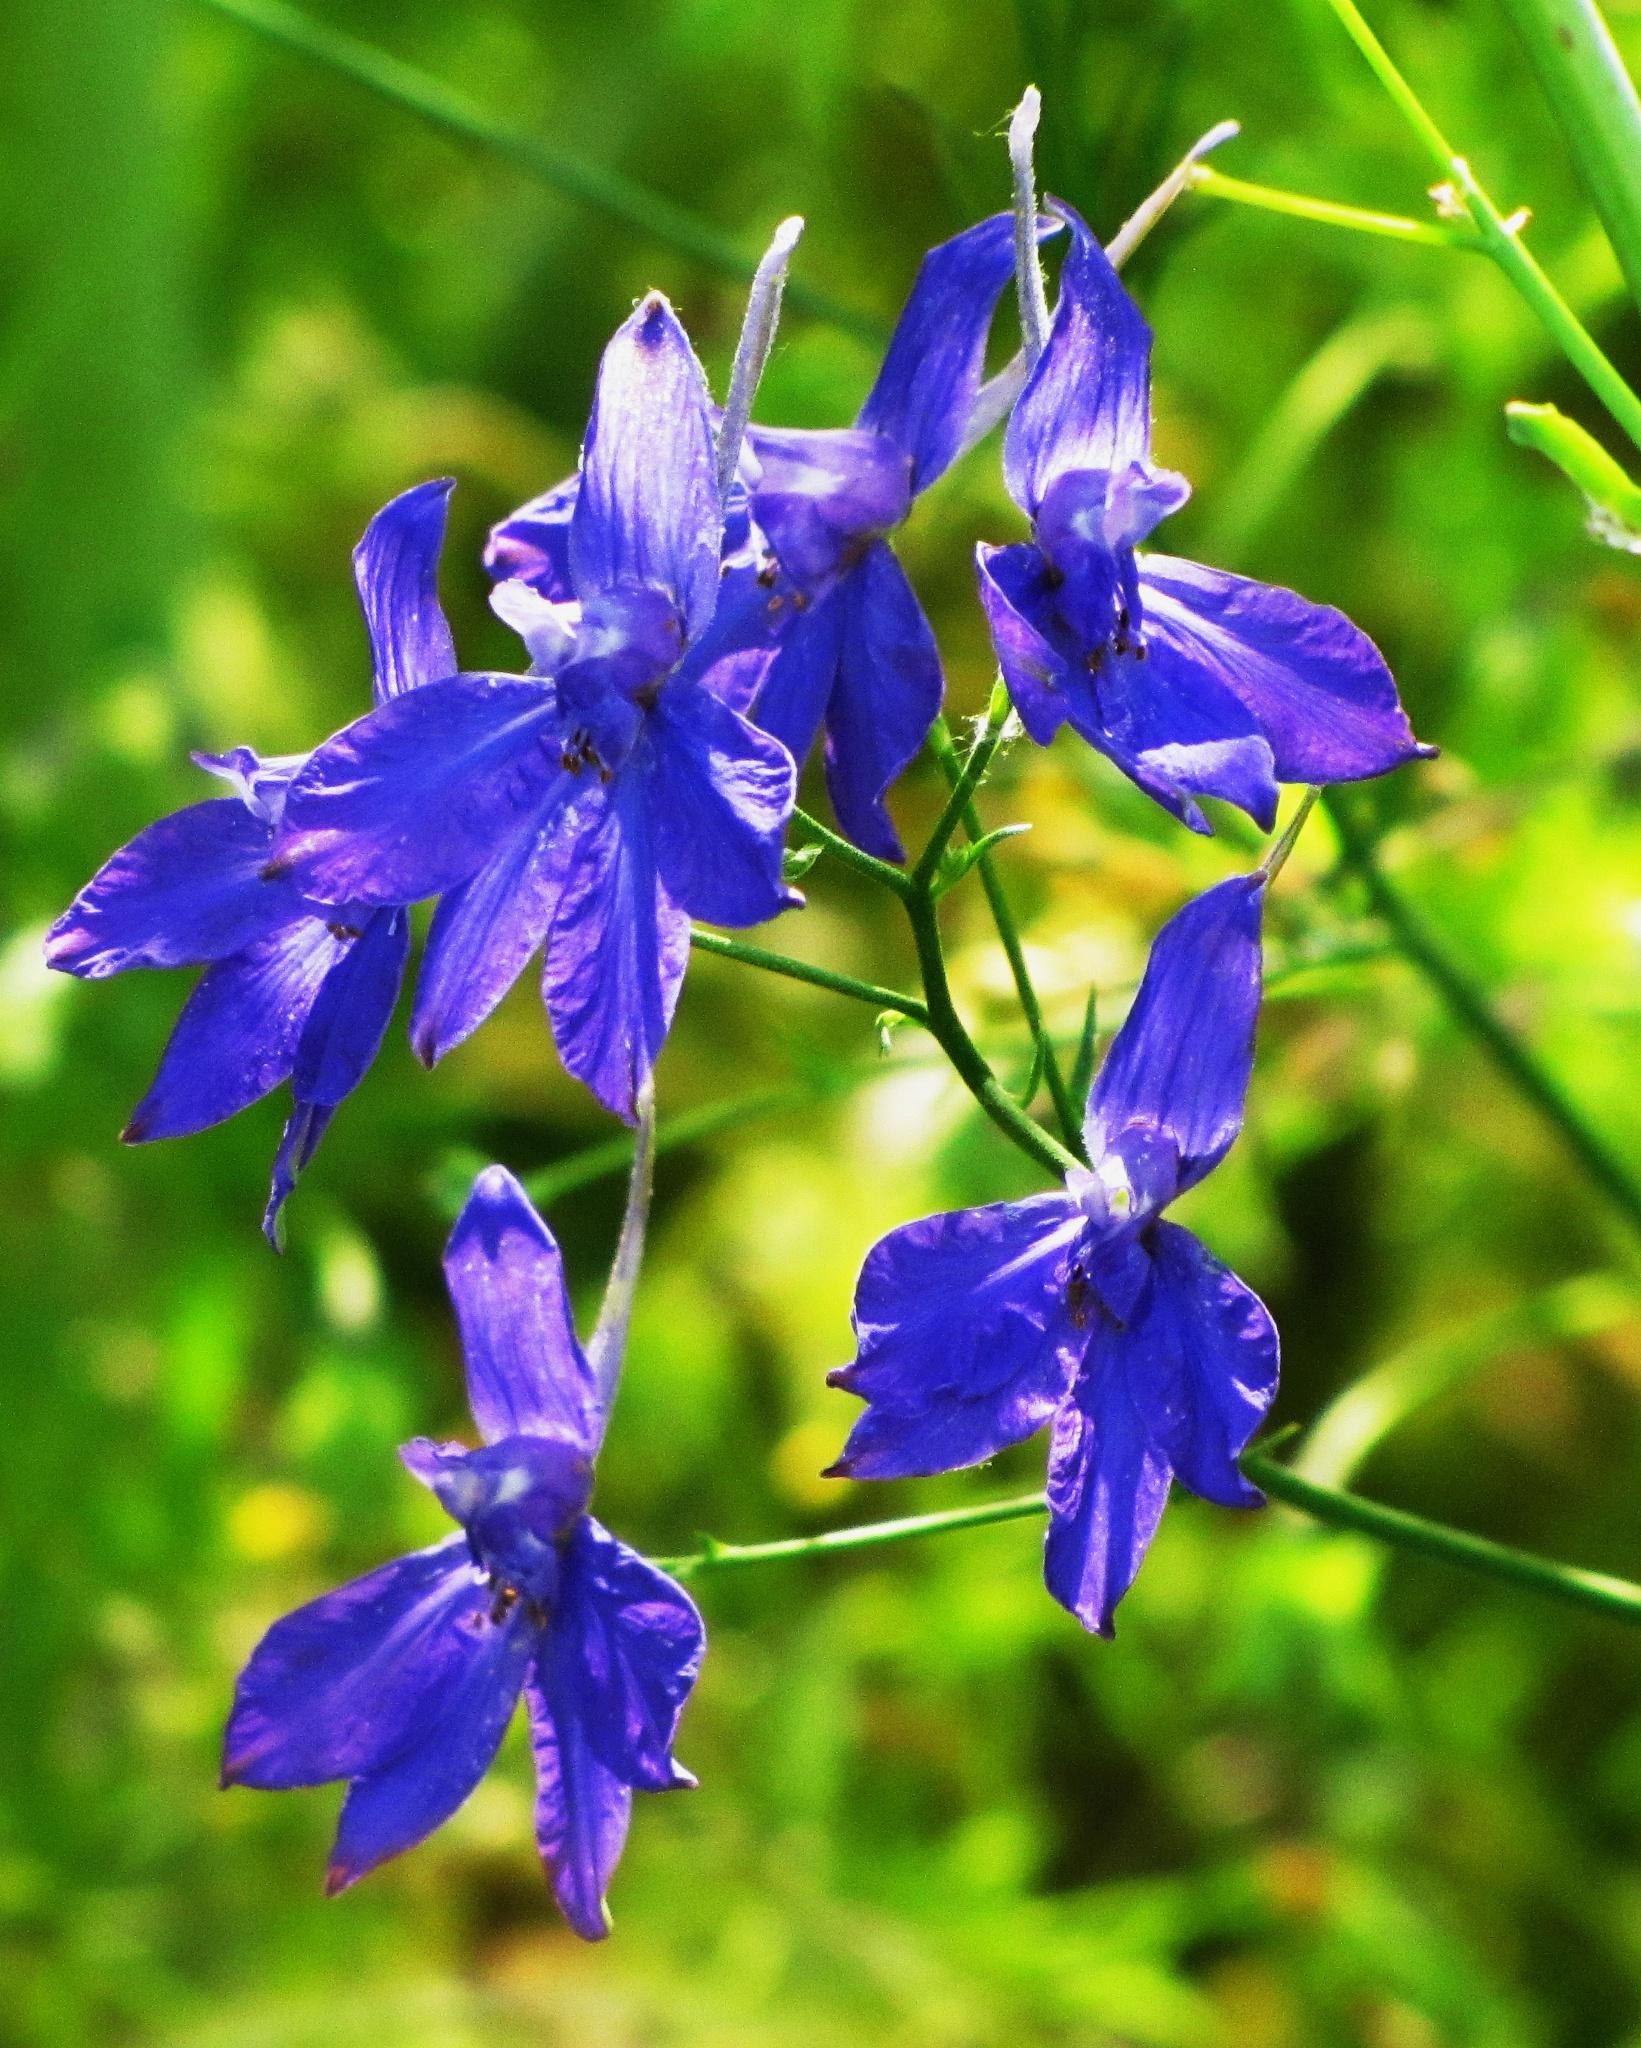 blue flowers by Ilga Freimane